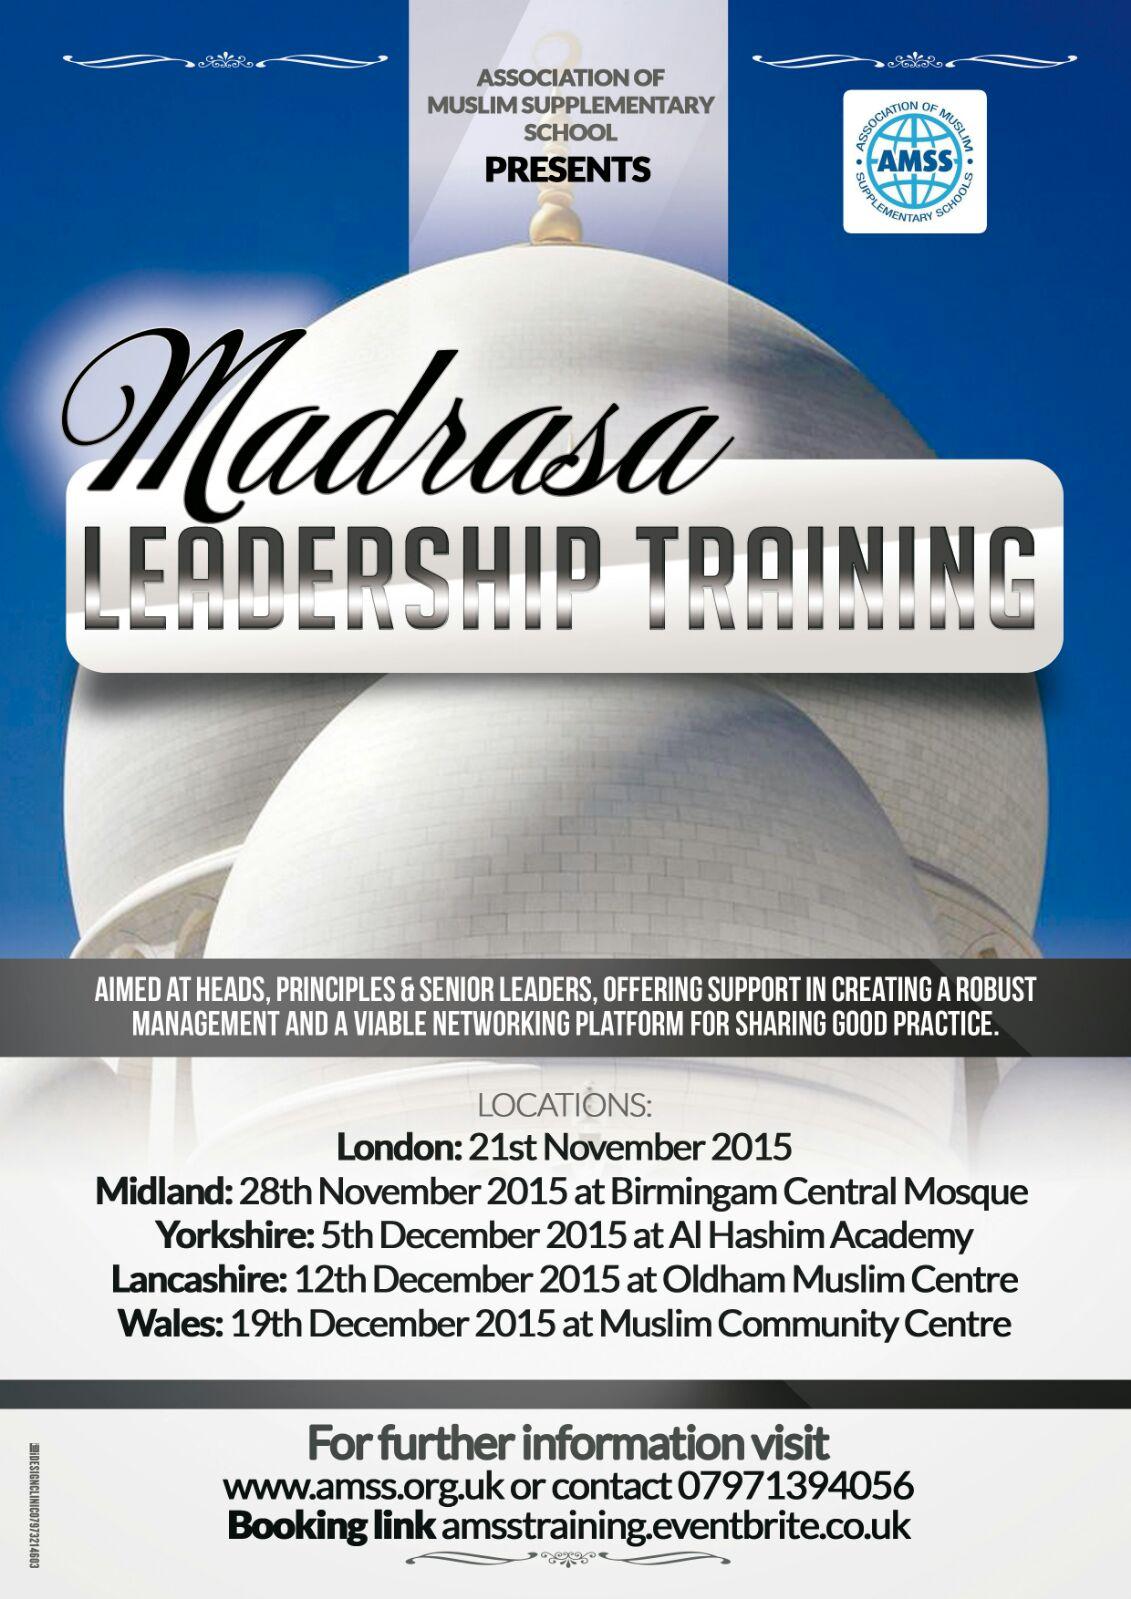 Madrassa Leadership Training Course